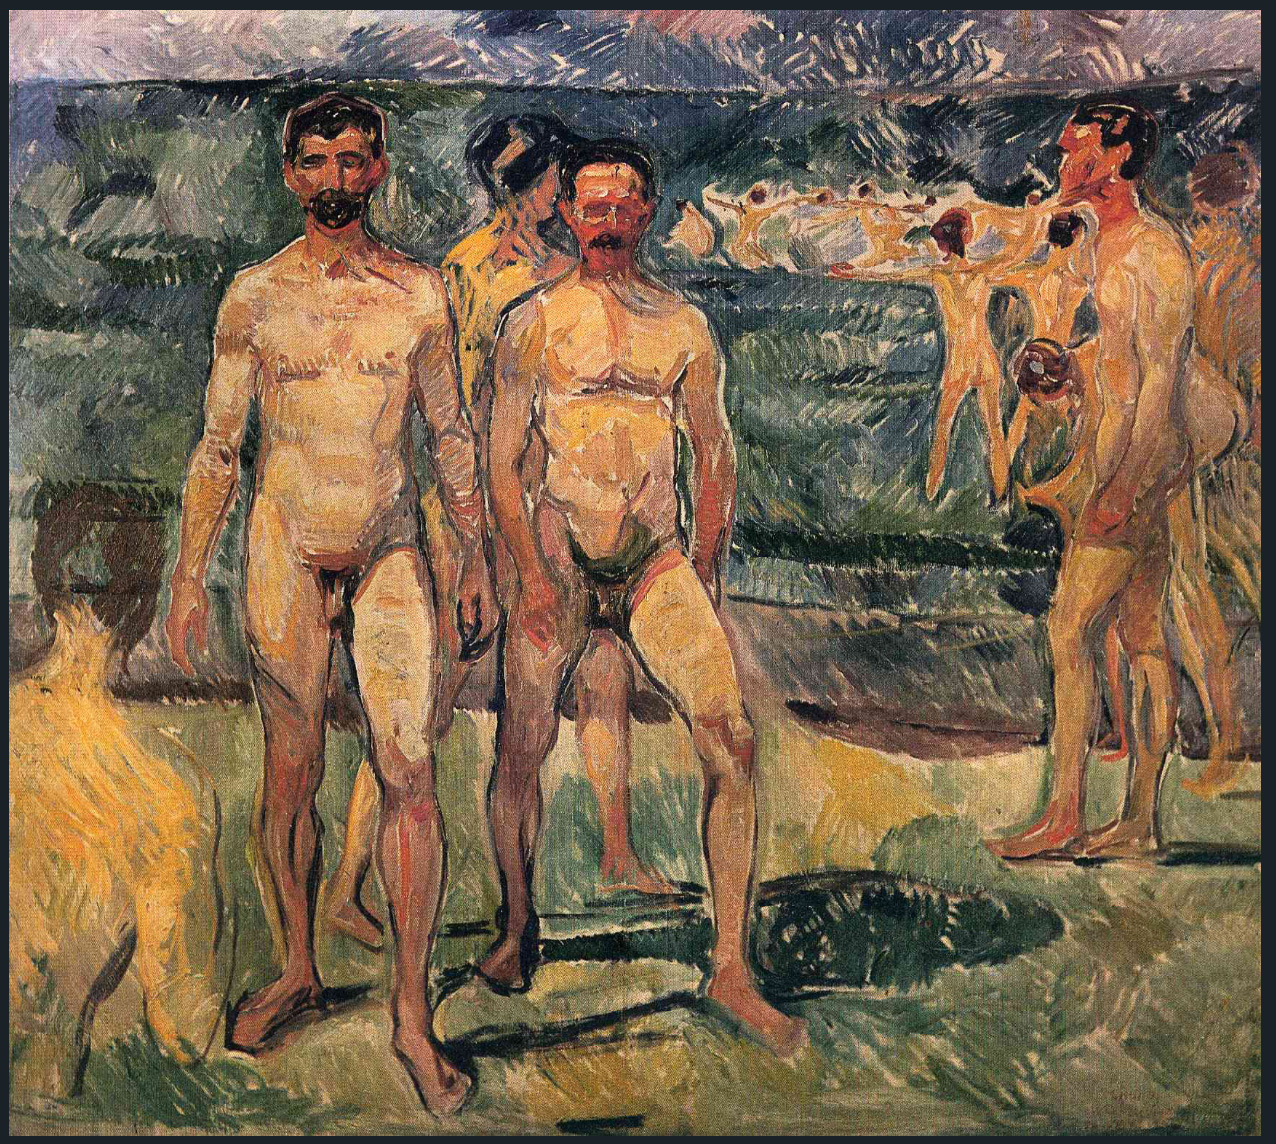 The Athenaeum - Bathing Men (1907) (Edvard Munch)